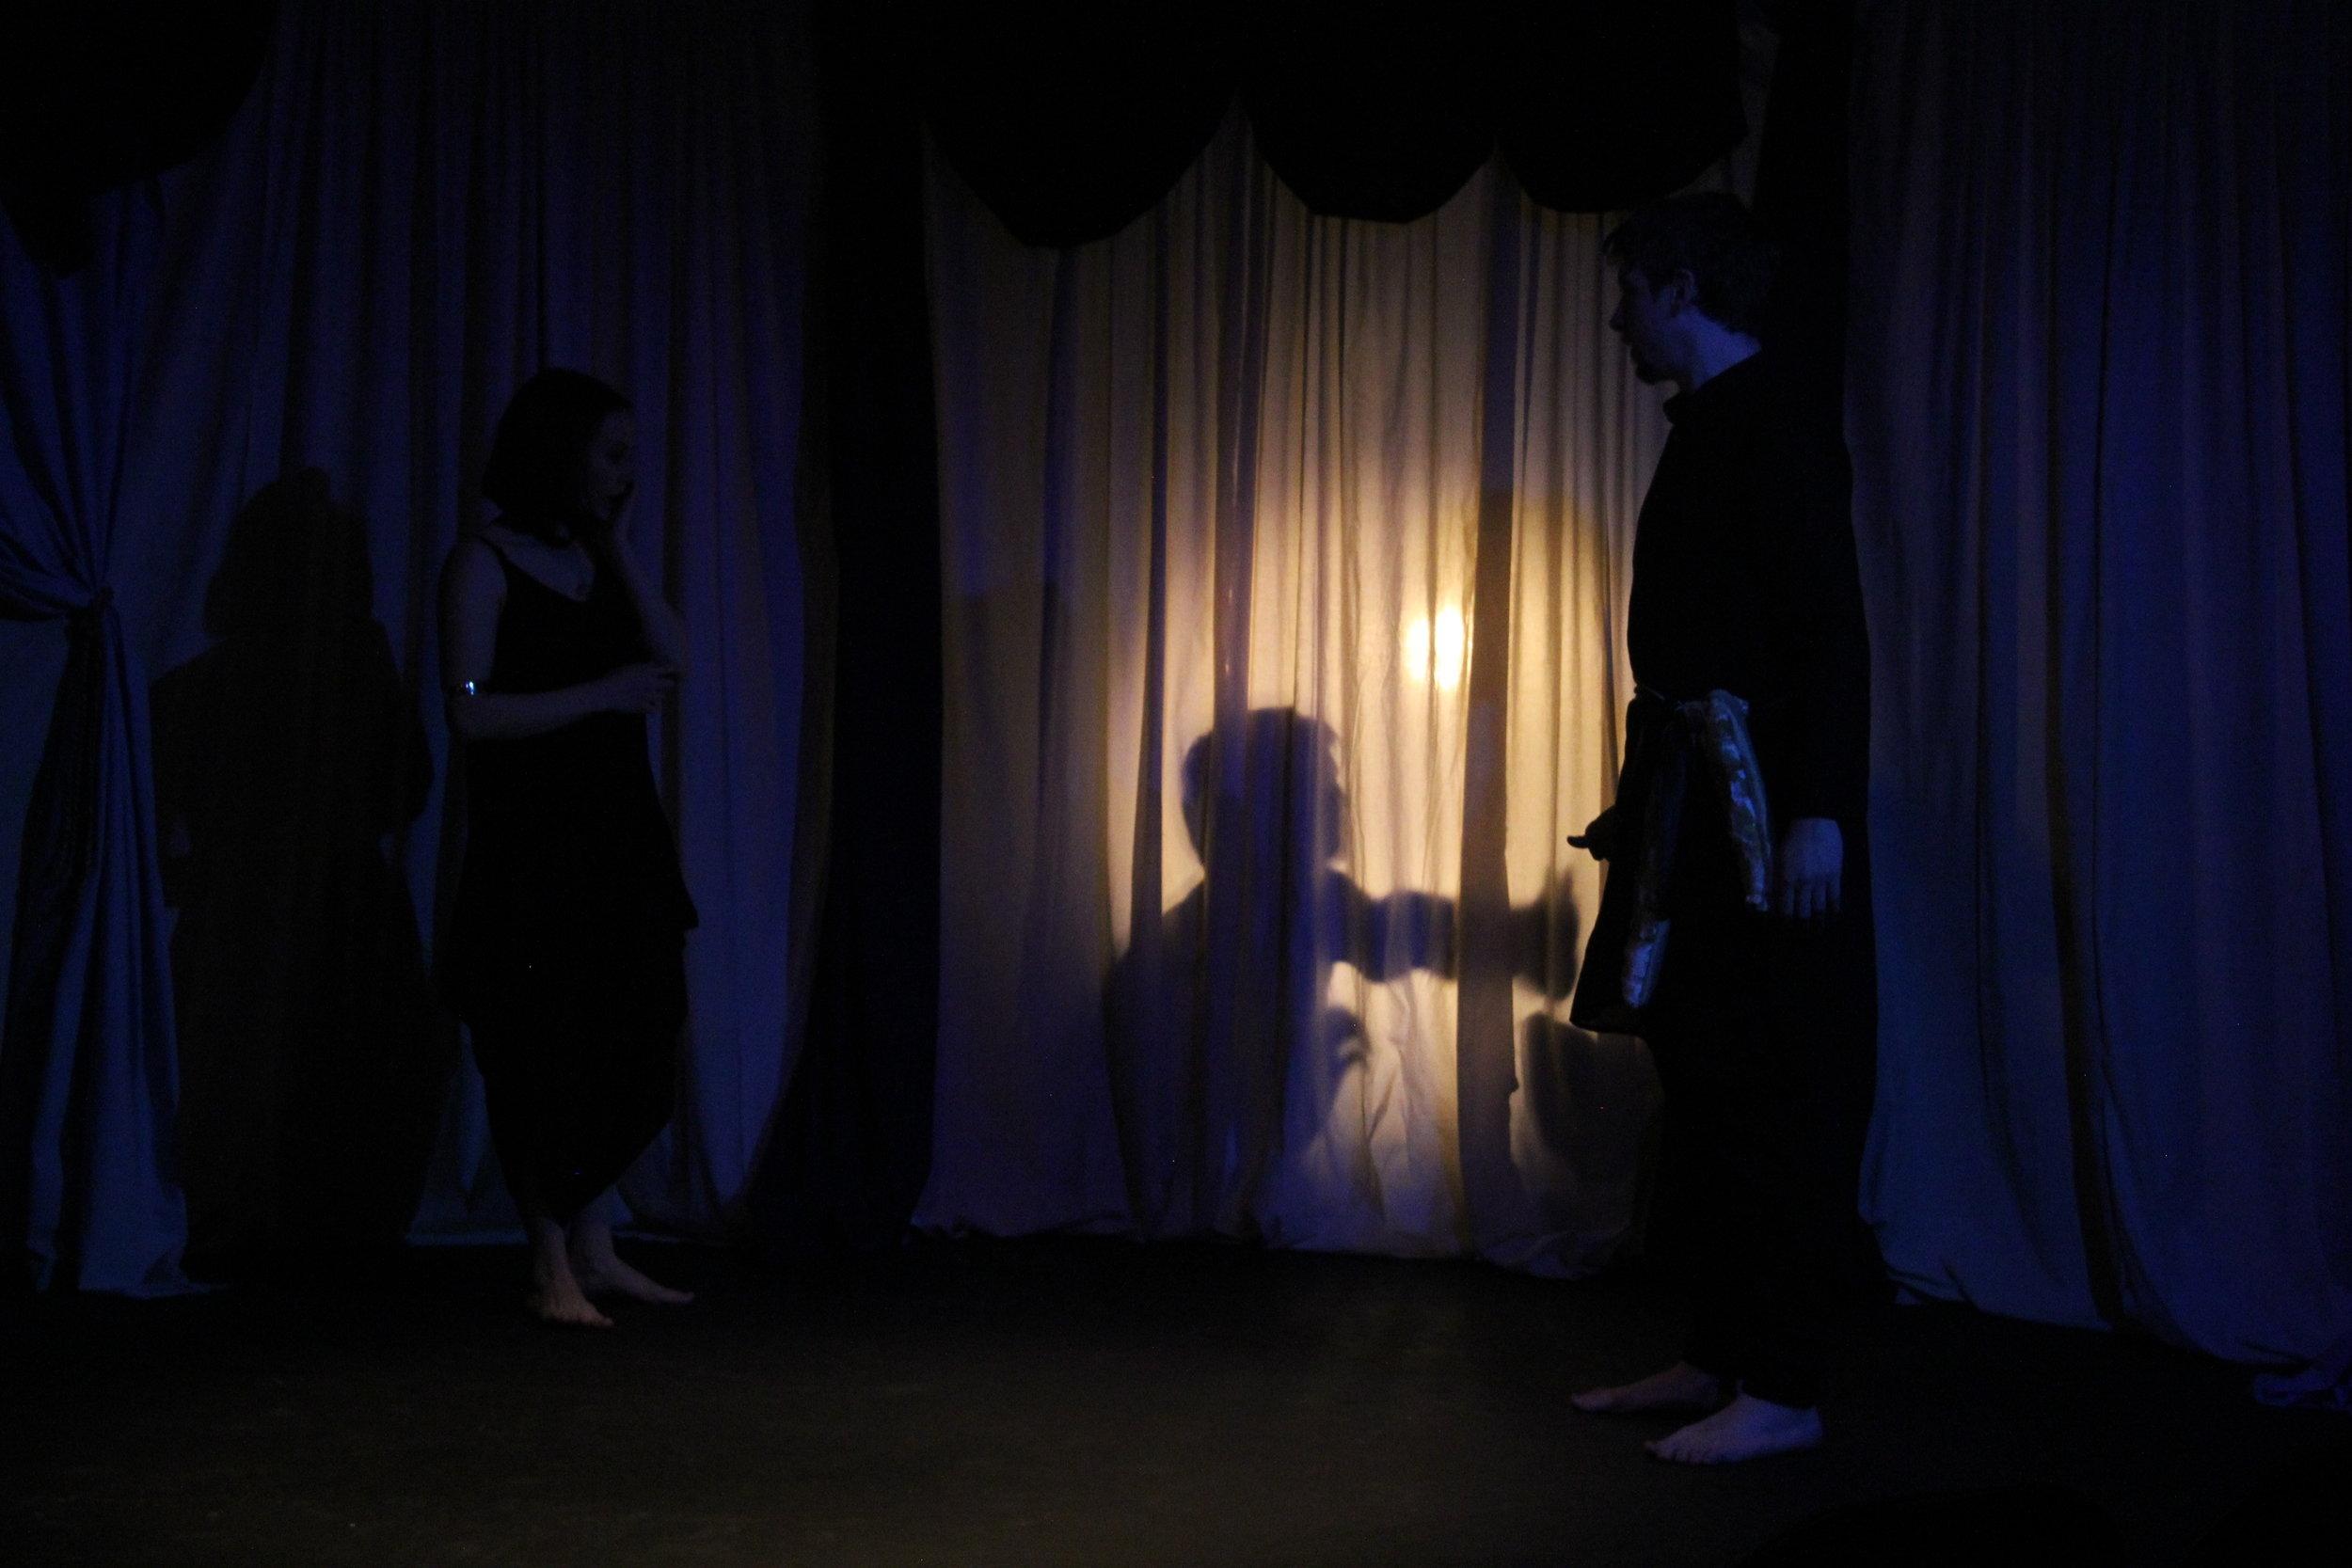 Shadows of Medea's children can be seen through a sheer curtain.